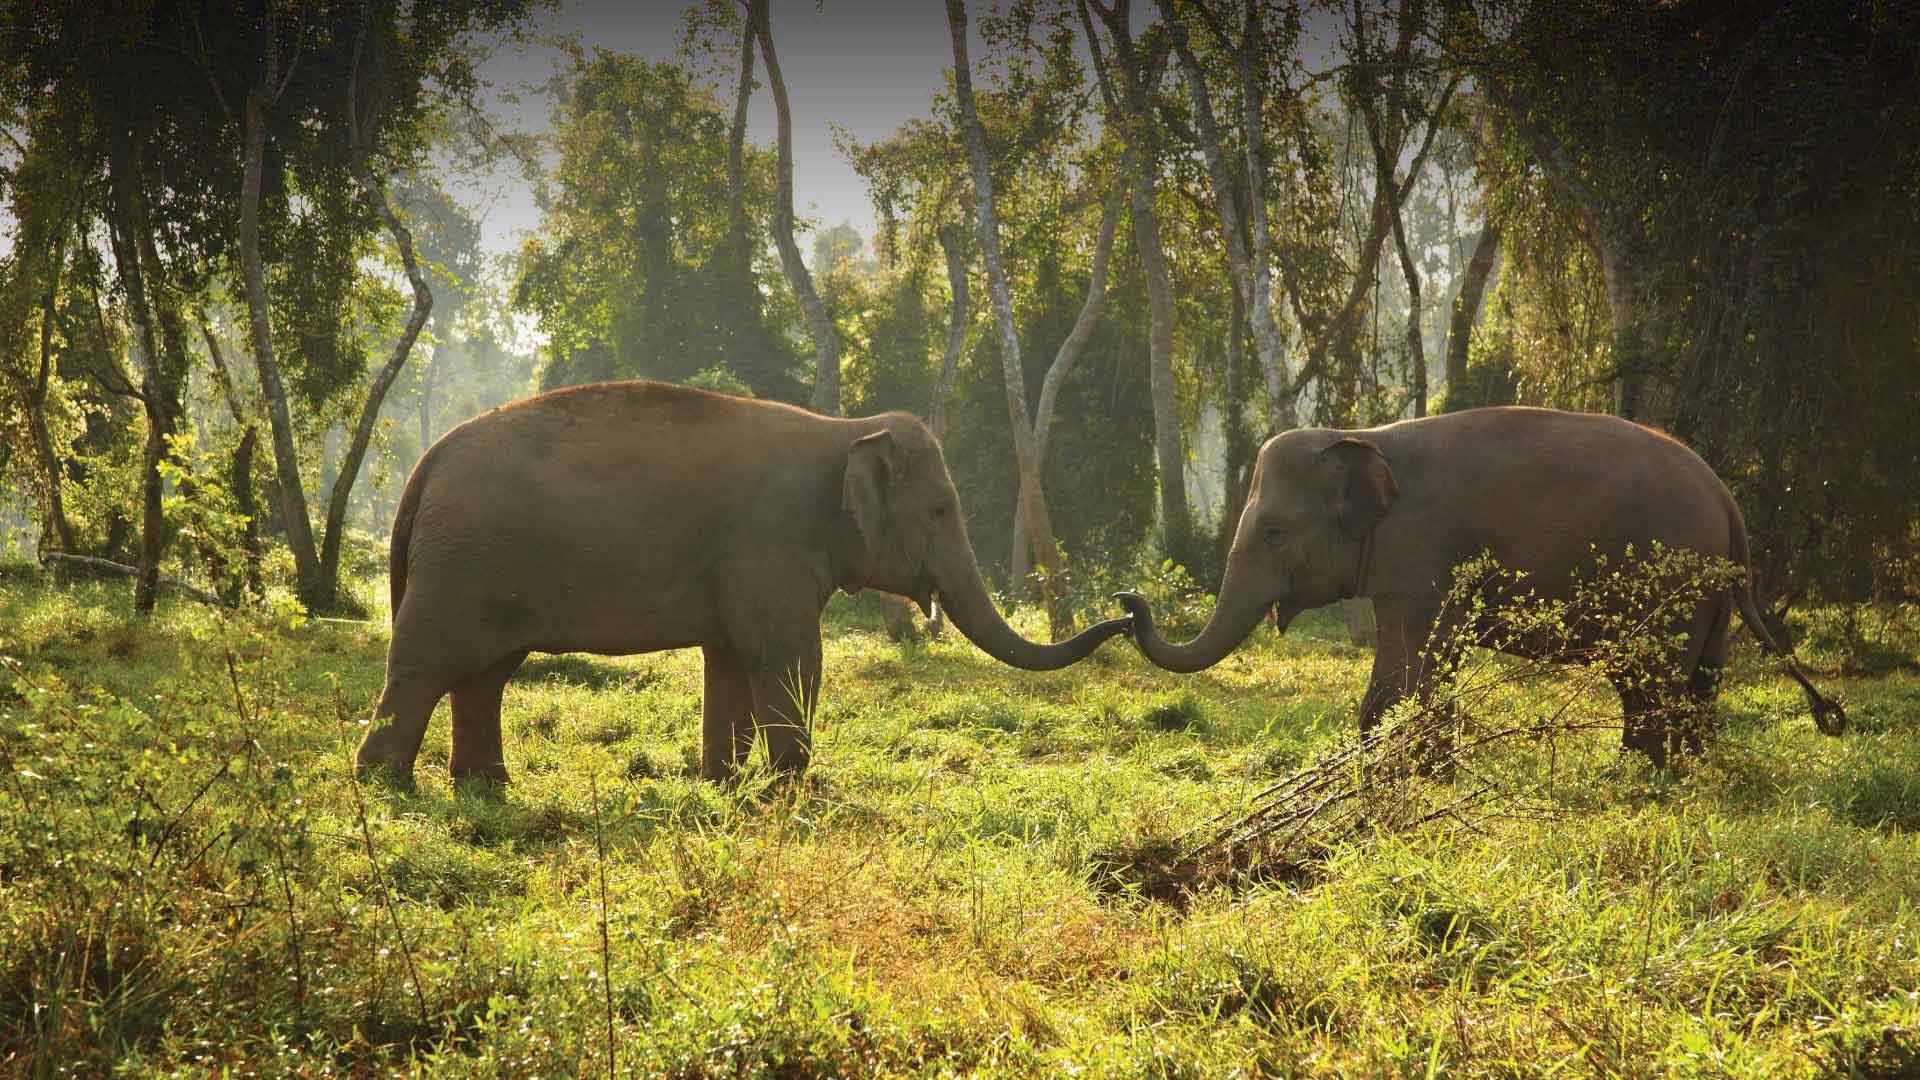 https://assets.anantara.com/image/upload/q_auto/media/minor/anantara/images/anantara-golden-triangle-elephant-camp--resort/the-resort/desktop-banner/anantara_golden_triangle_elephant_couple_header_1920x1080.jpg